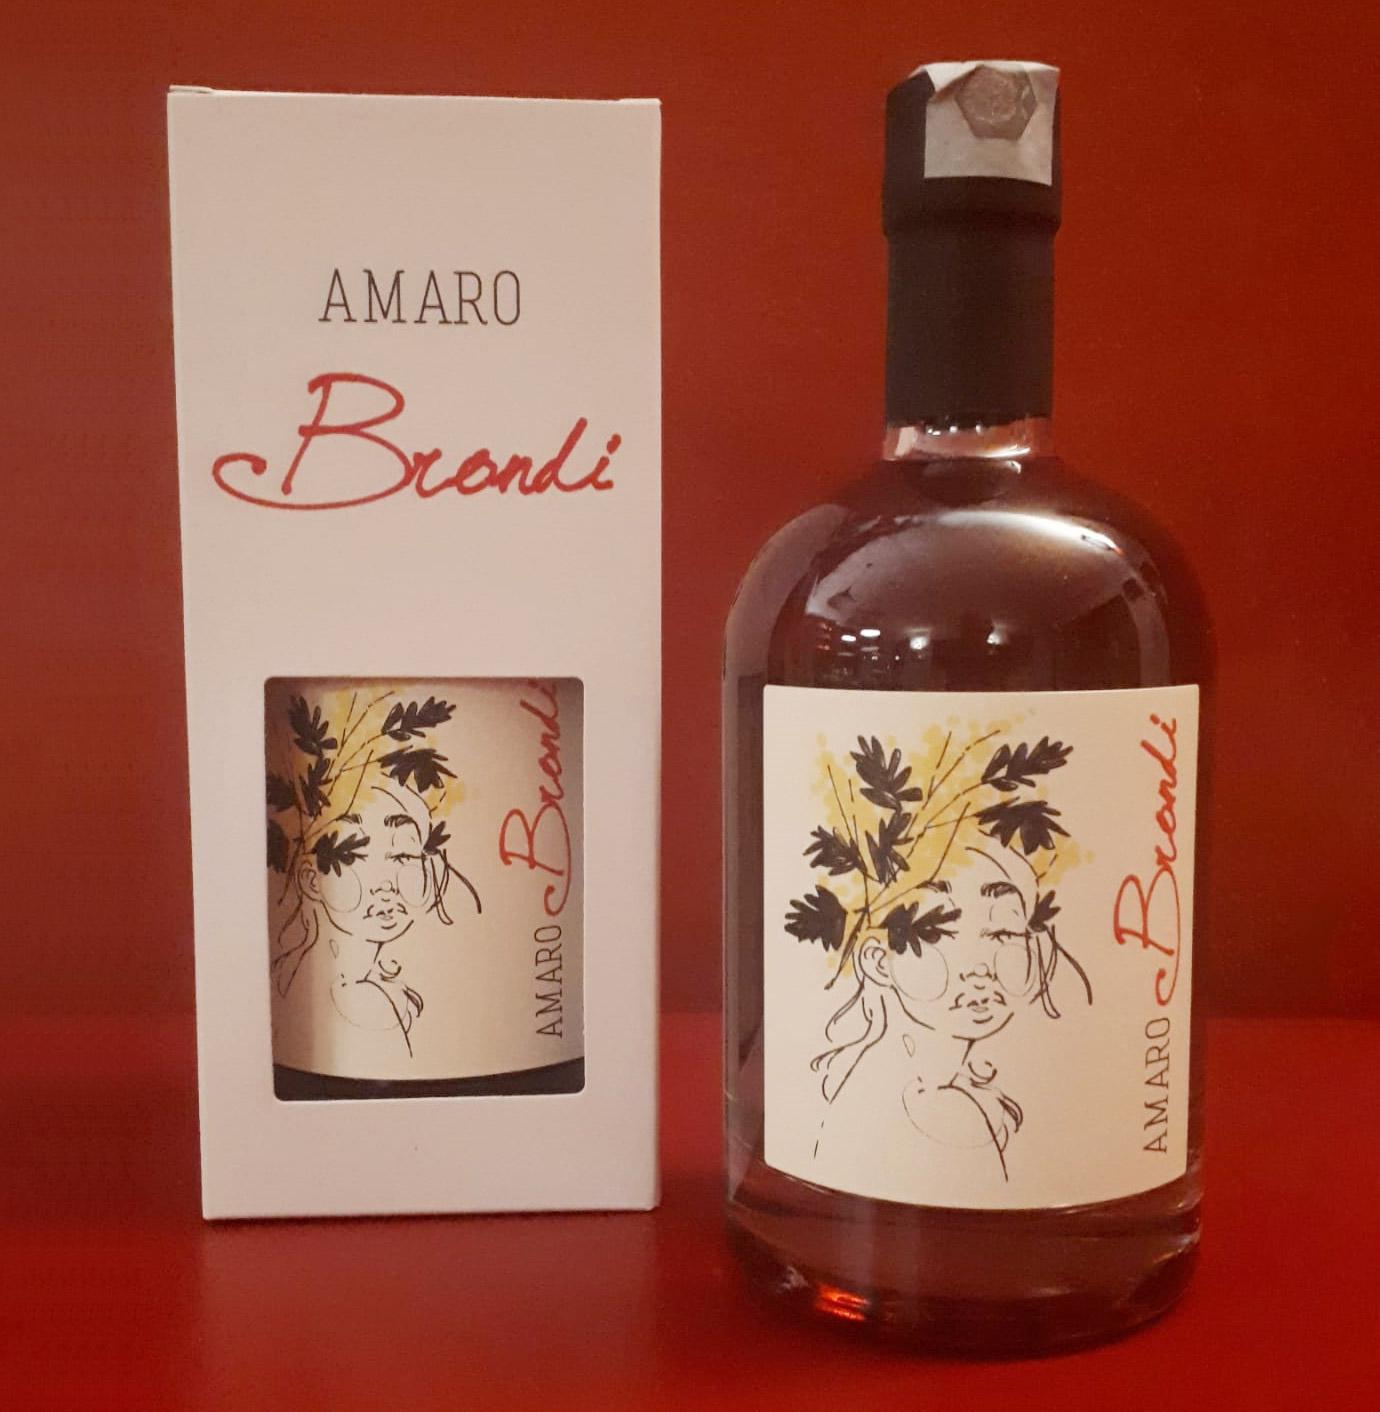 Nuovo Amaro Brondi